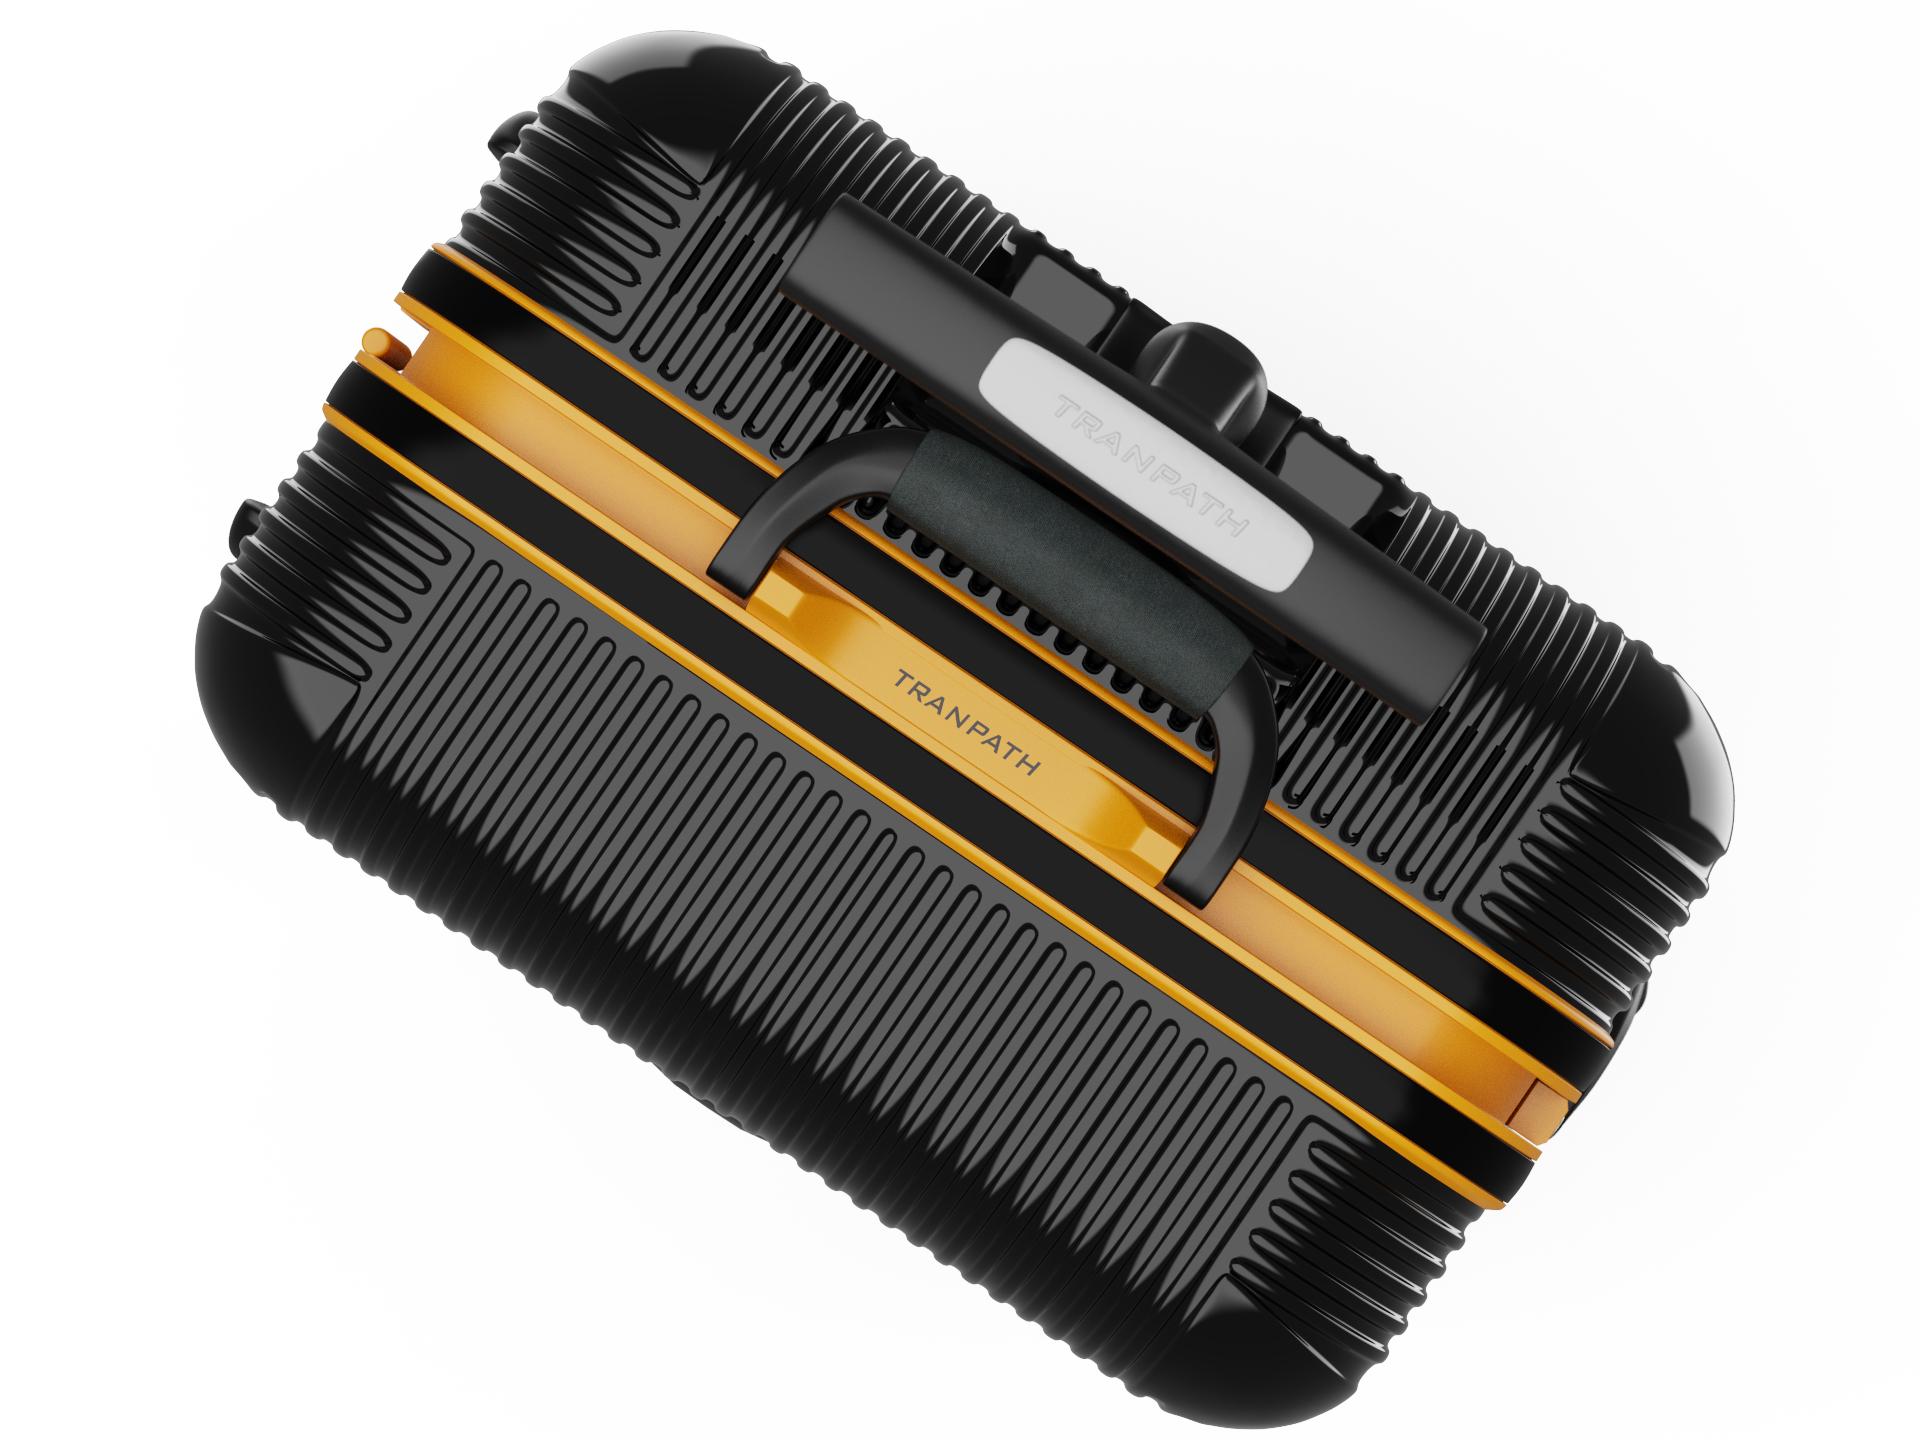 Tranpath Suitcase